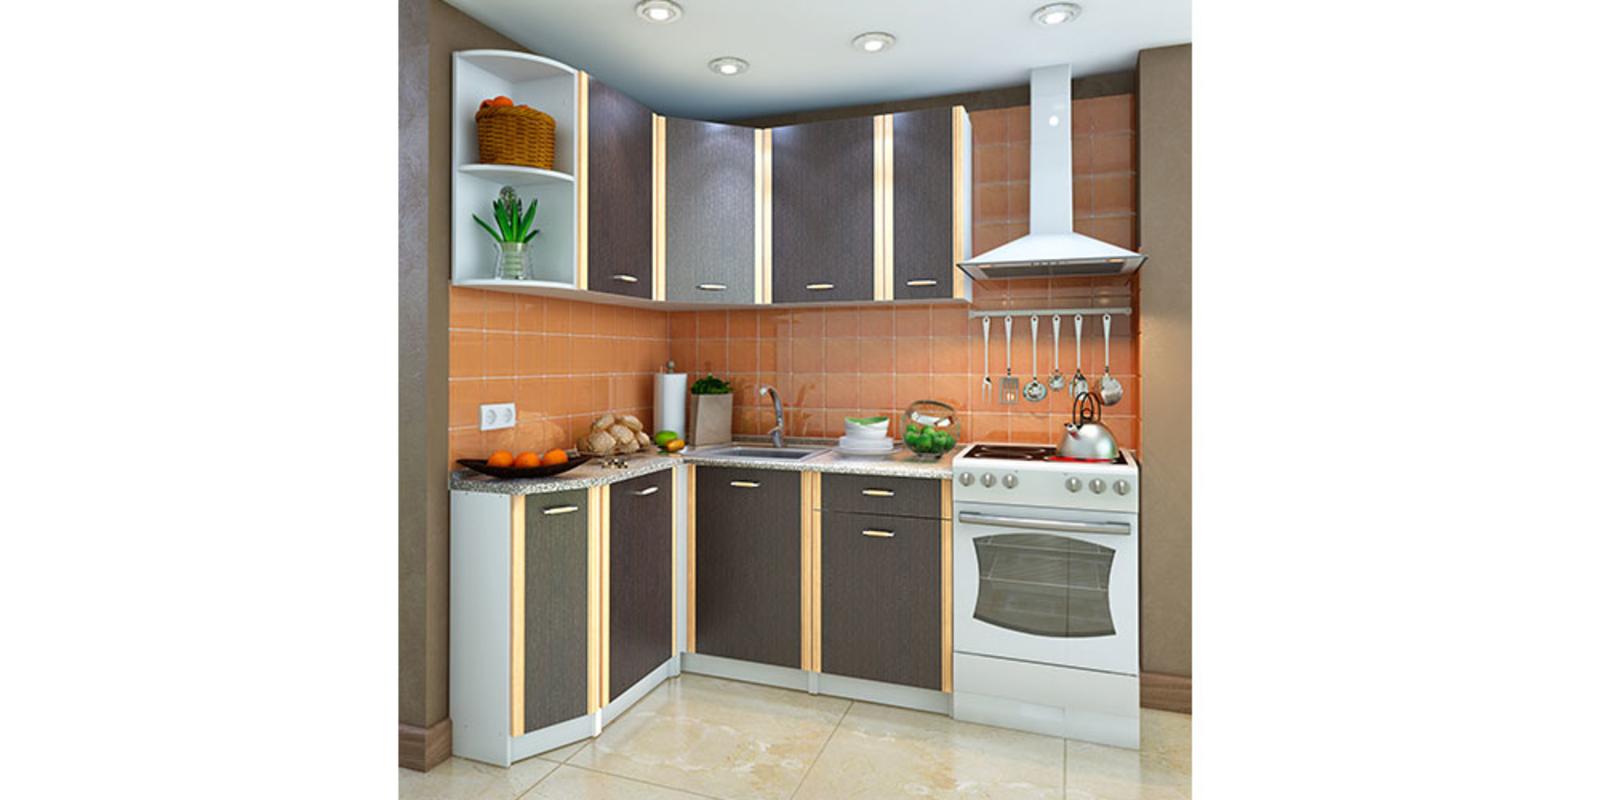 Кухонный гарнитур Лагуна левый угол (белый/венге)